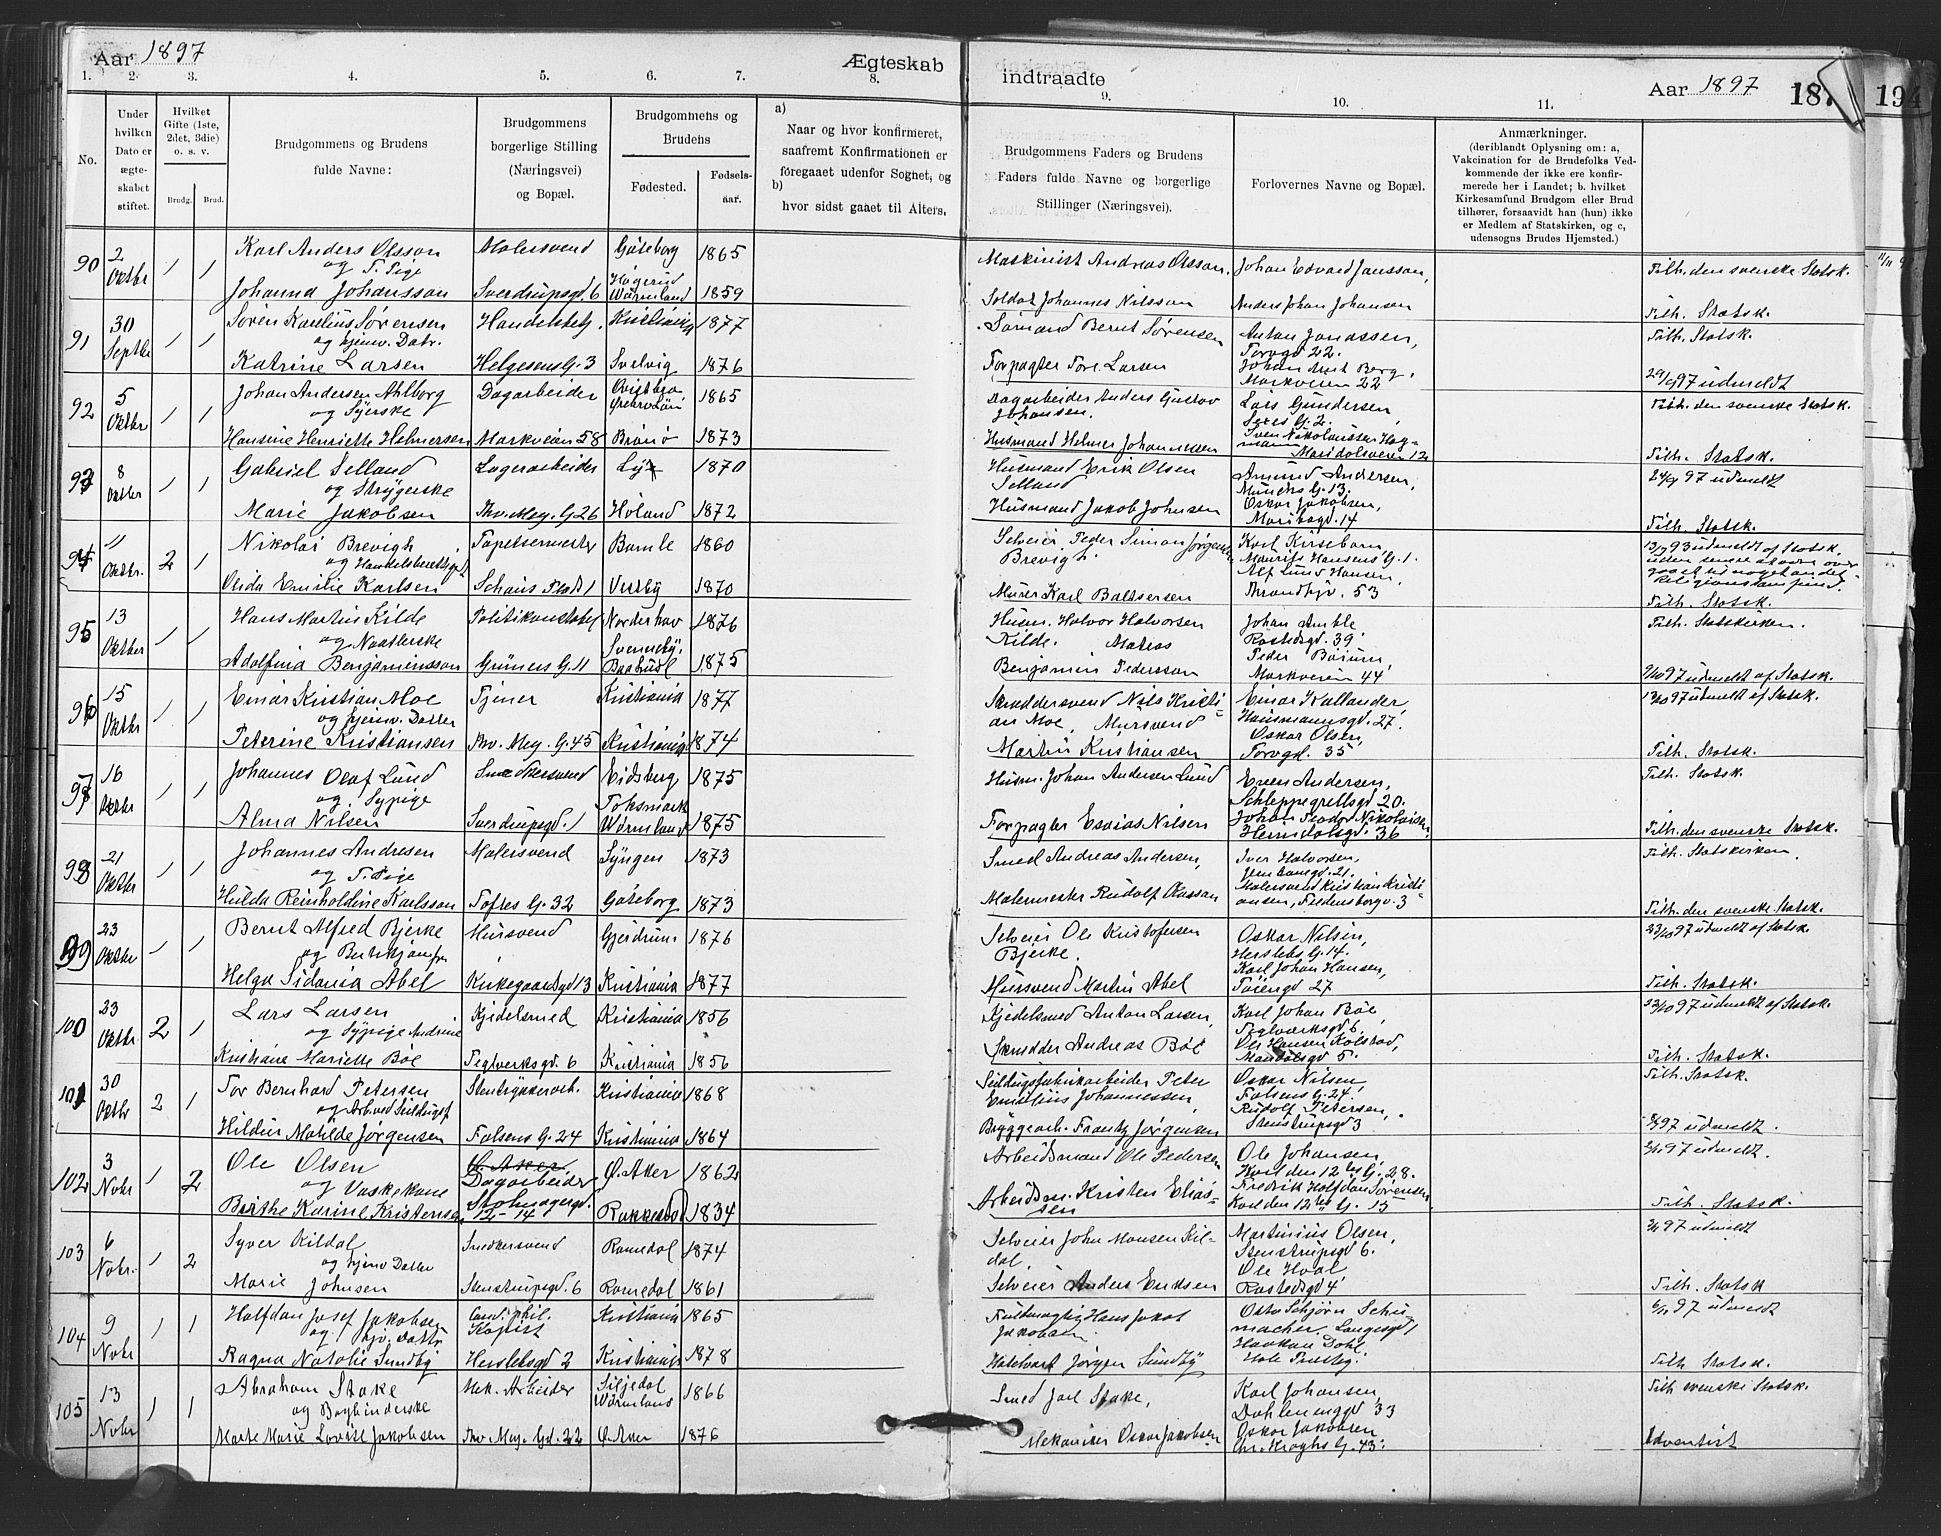 SAO, Paulus prestekontor Kirkebøker, F/Fa/L0012: Parish register (official) no. 12, 1897-1908, p. 187